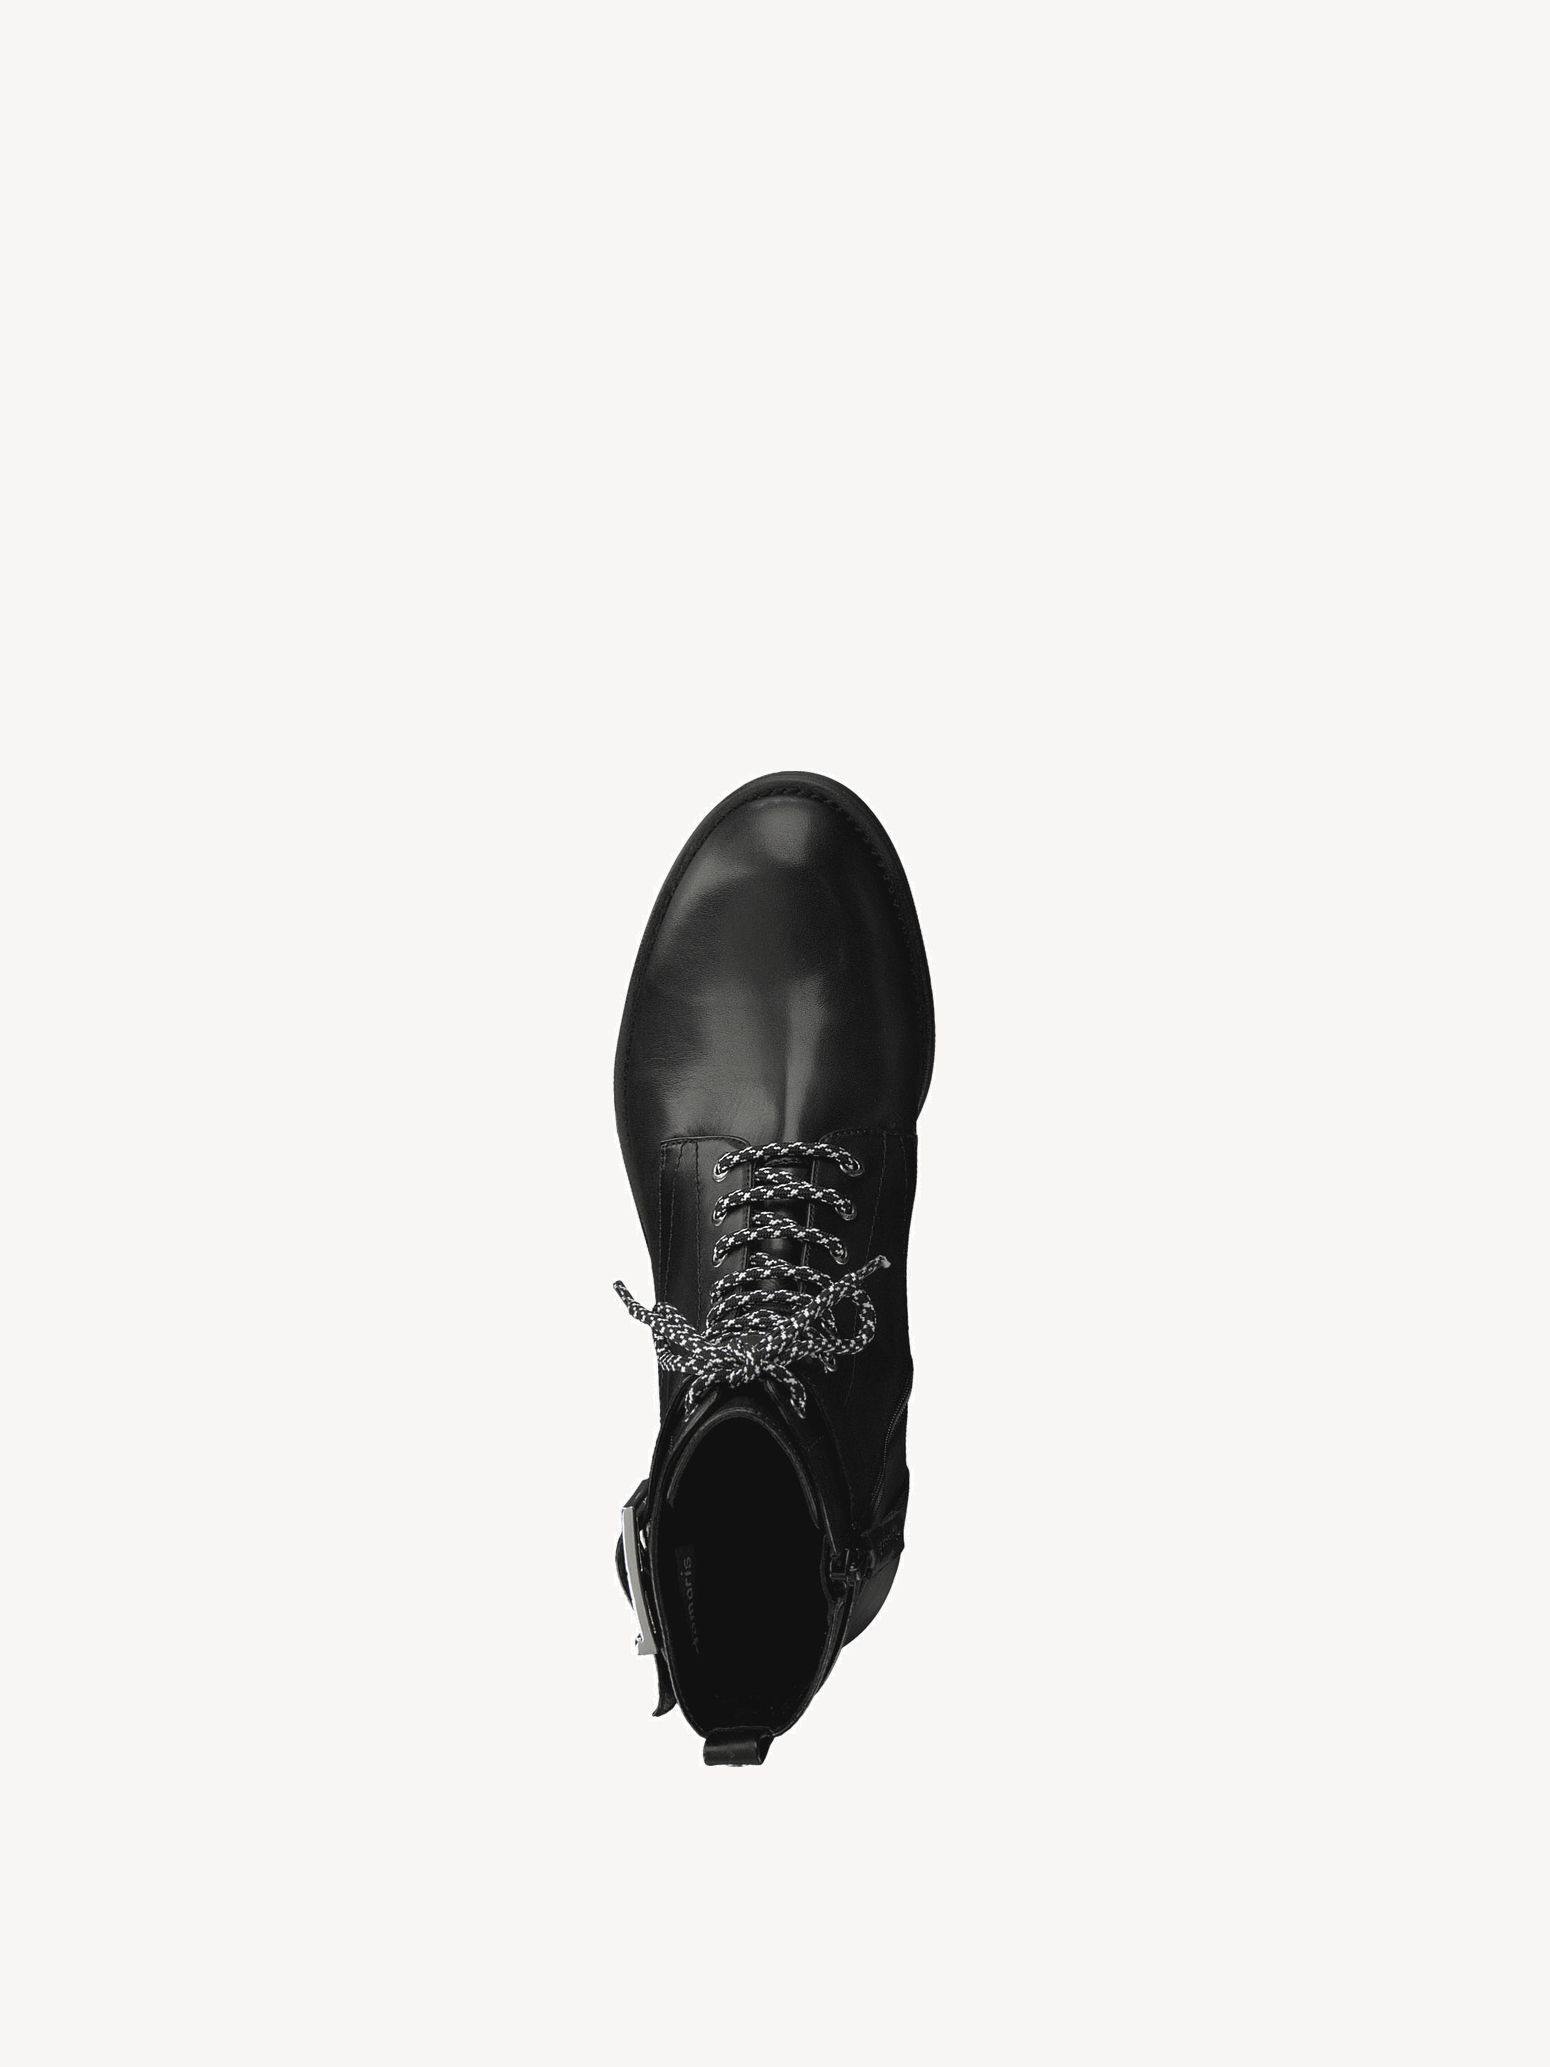 Stiefeletten TAMARIS 1 25123 33 Black 001 Boots